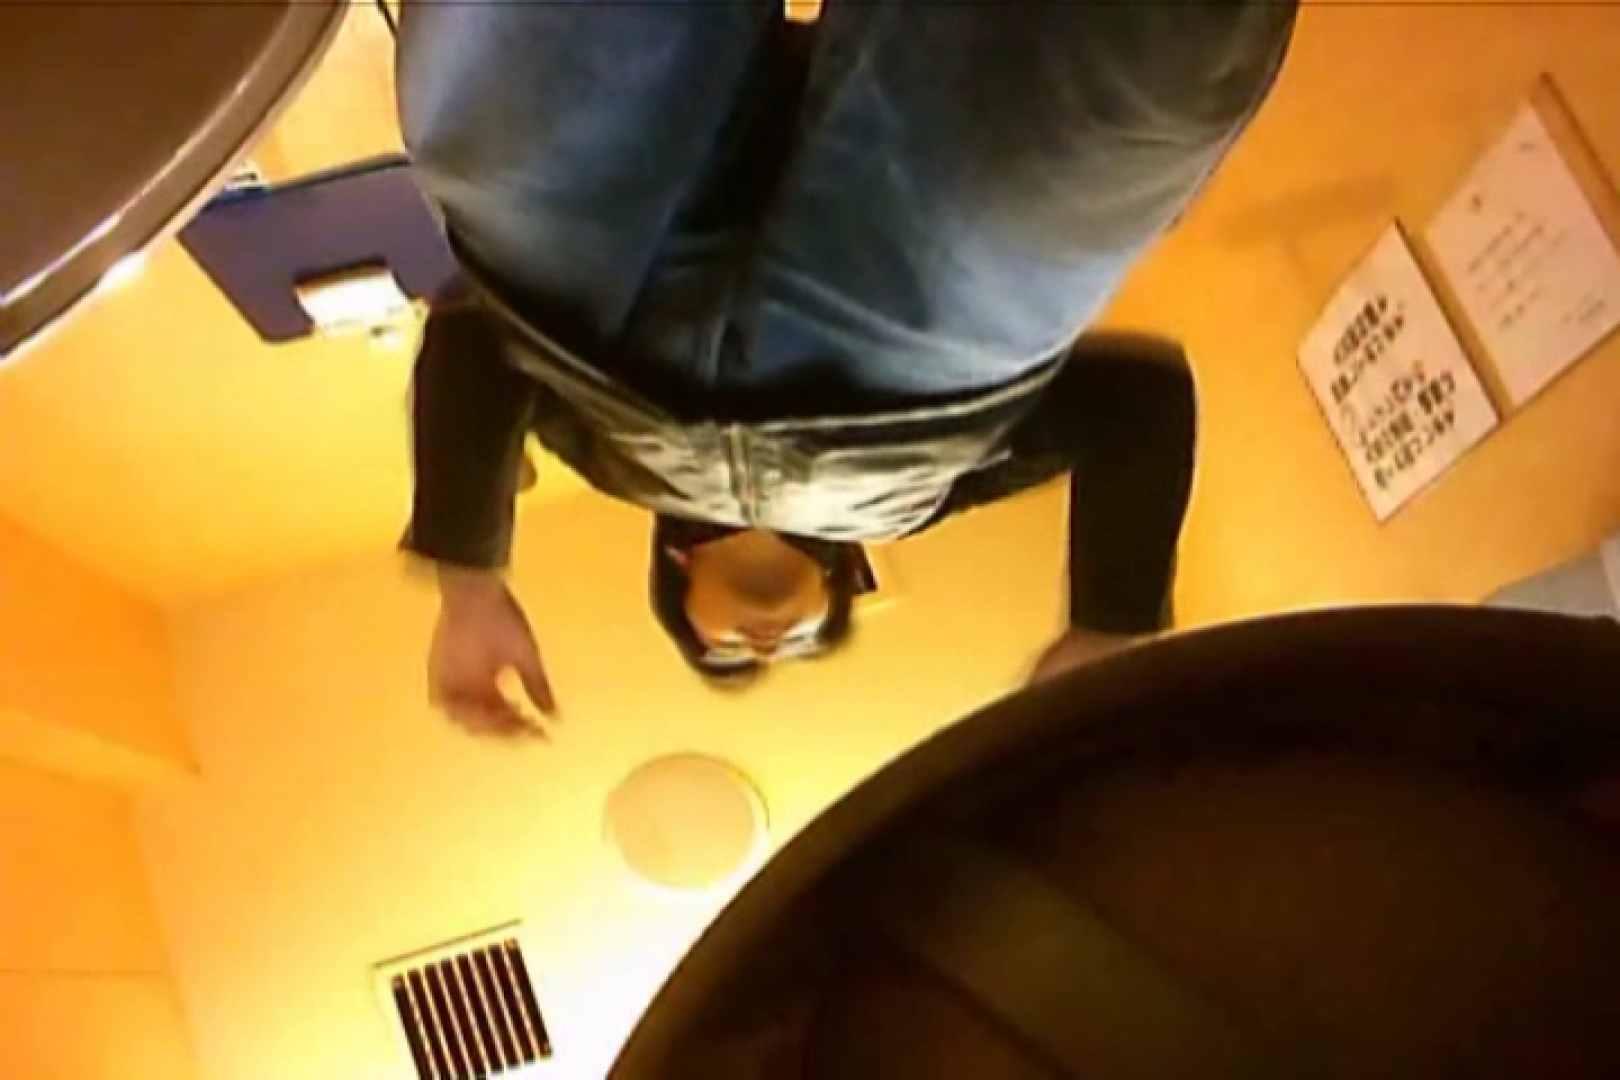 SEASON 2ND!掴み取りさんの洗面所覗き!in新幹線!VOL.03 スーツボーイズ | ボーイズ私服  76pic 67